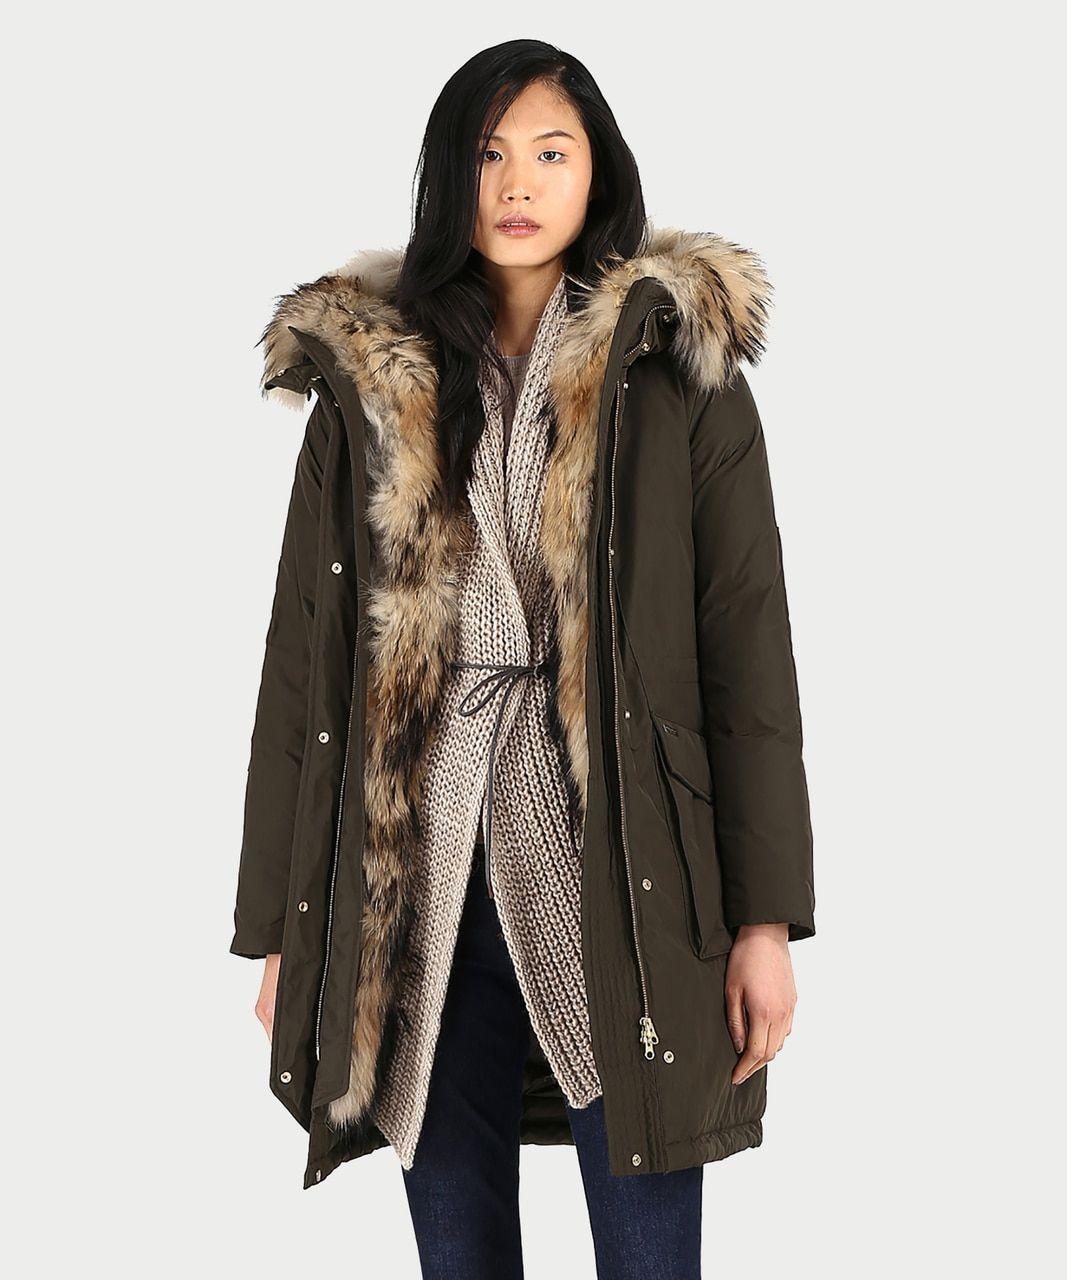 low priced 10fcf b4673 Women's Military Down Parka - John Rich & Bros | Fashion in ...